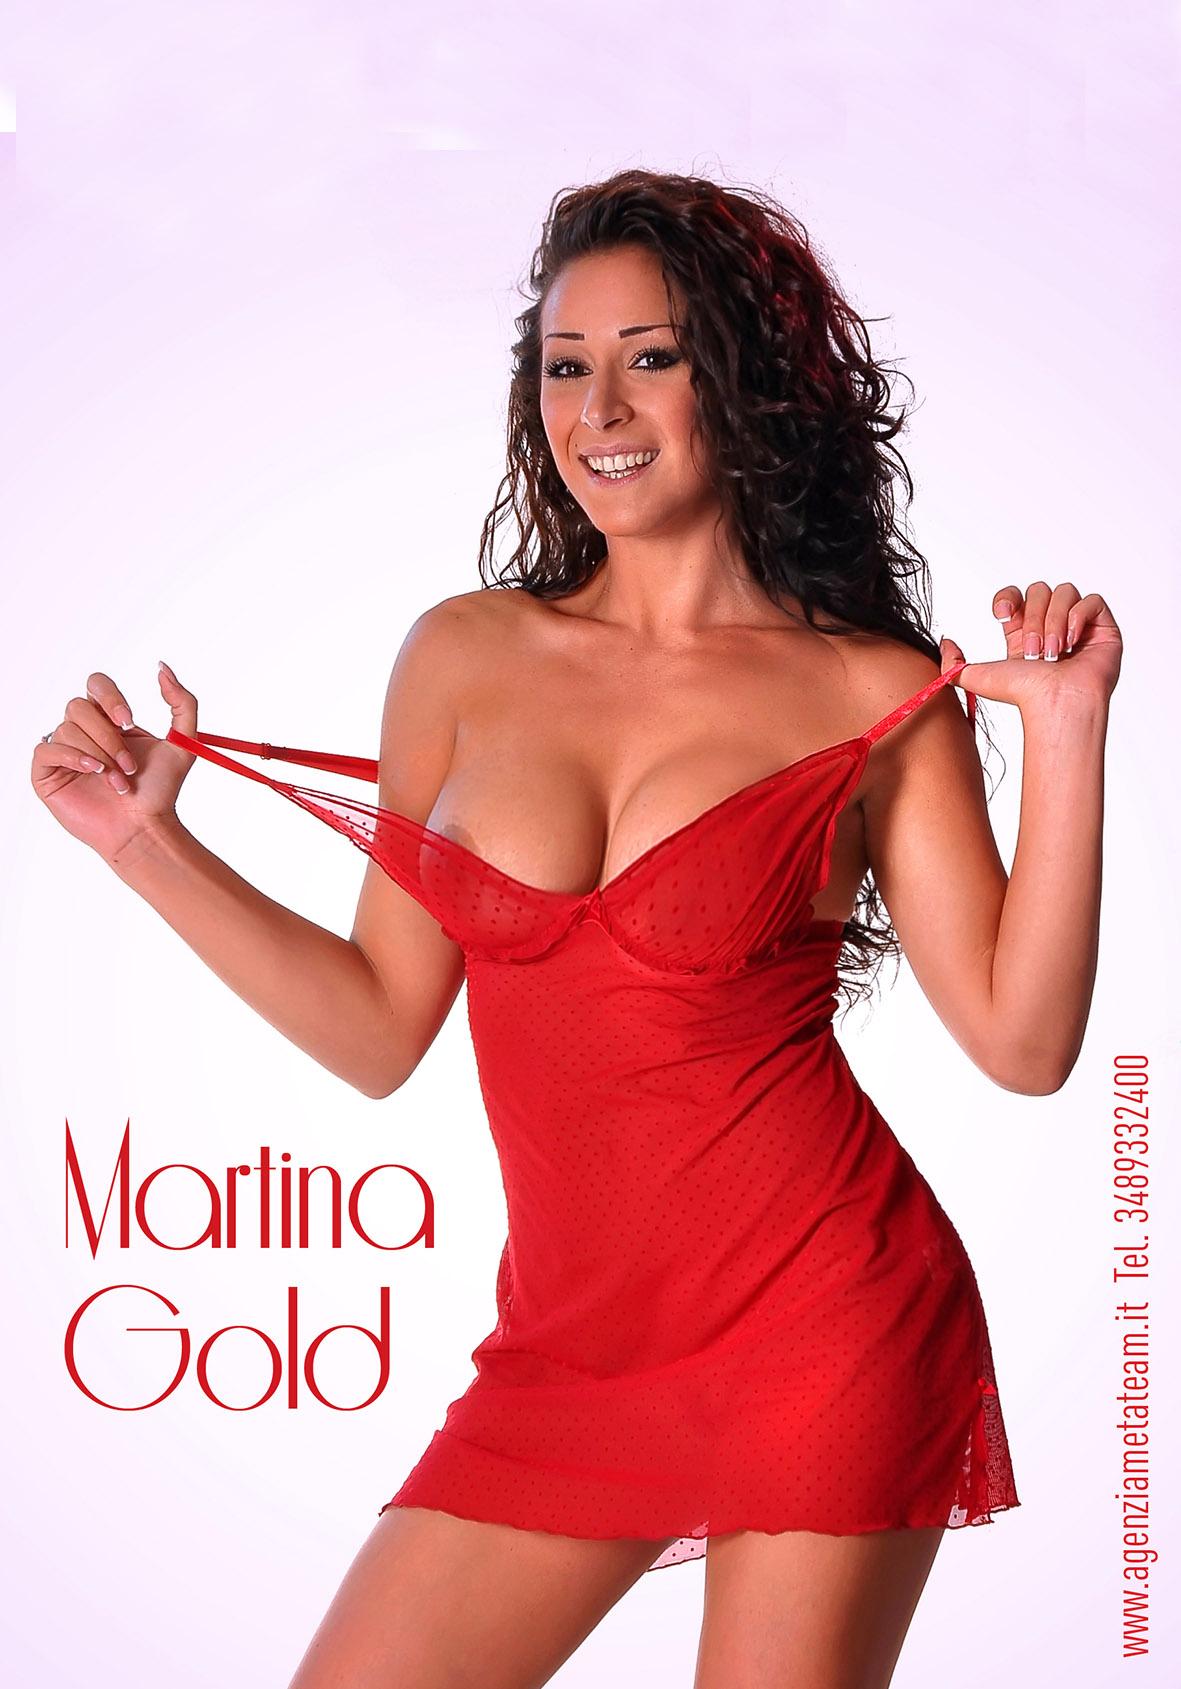 Martina Gold 5.jpg